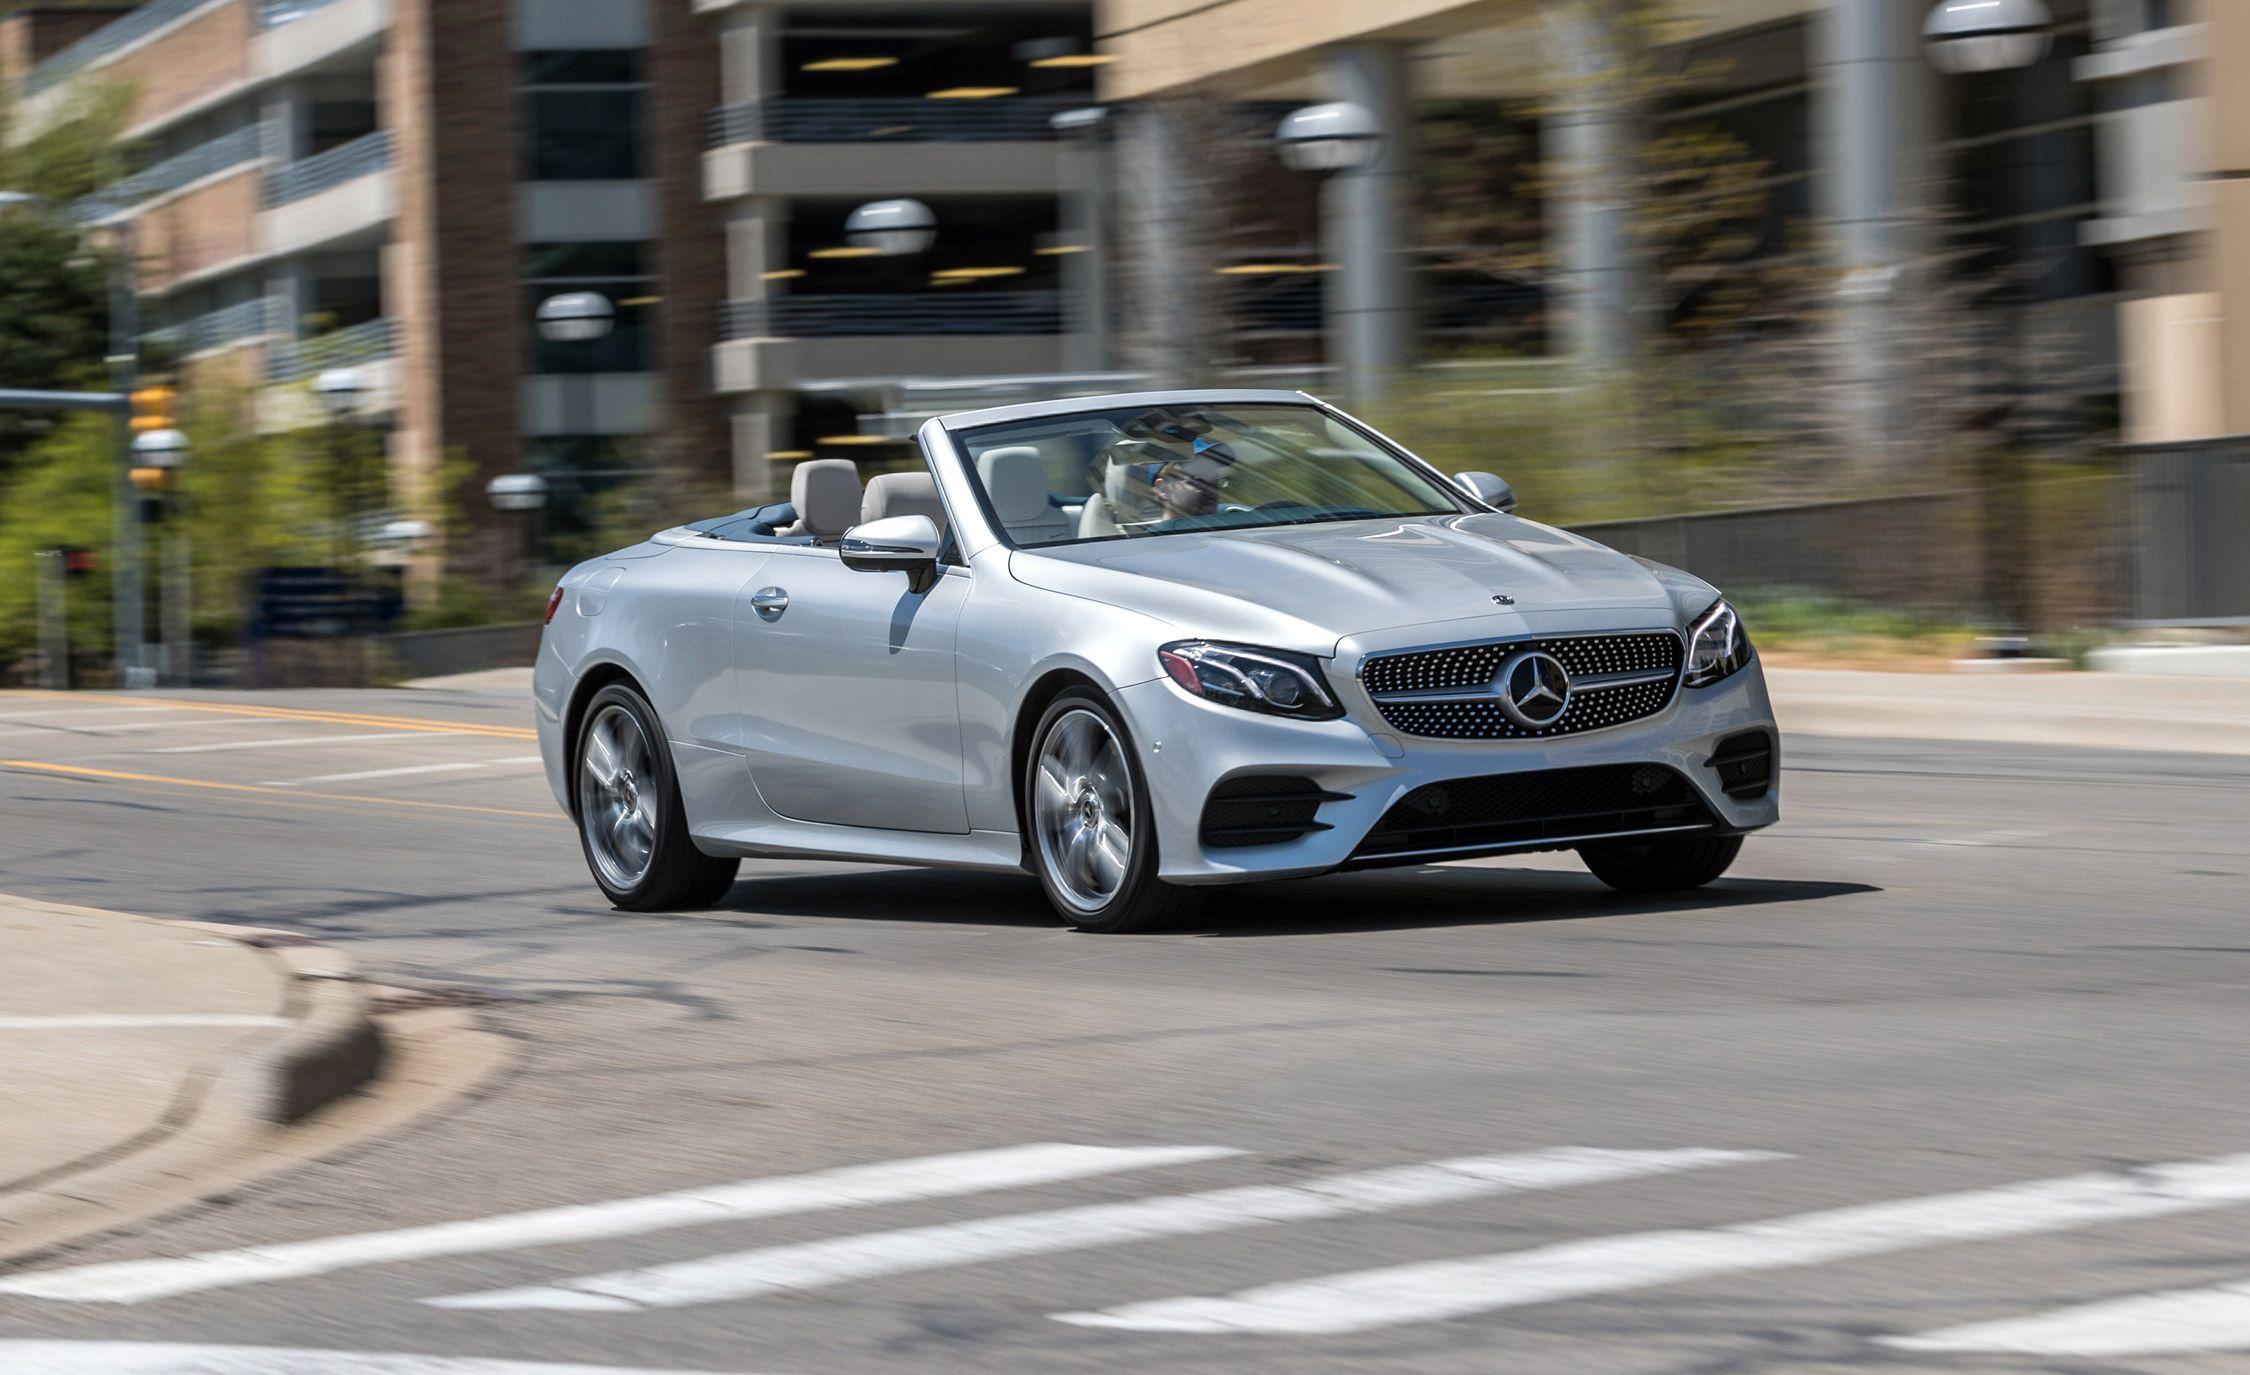 2018-mercedes-benz-e400-cabriolet-4matic-placement-1530299342 Mercedes E400 Cabriolet Rental Los Angeles